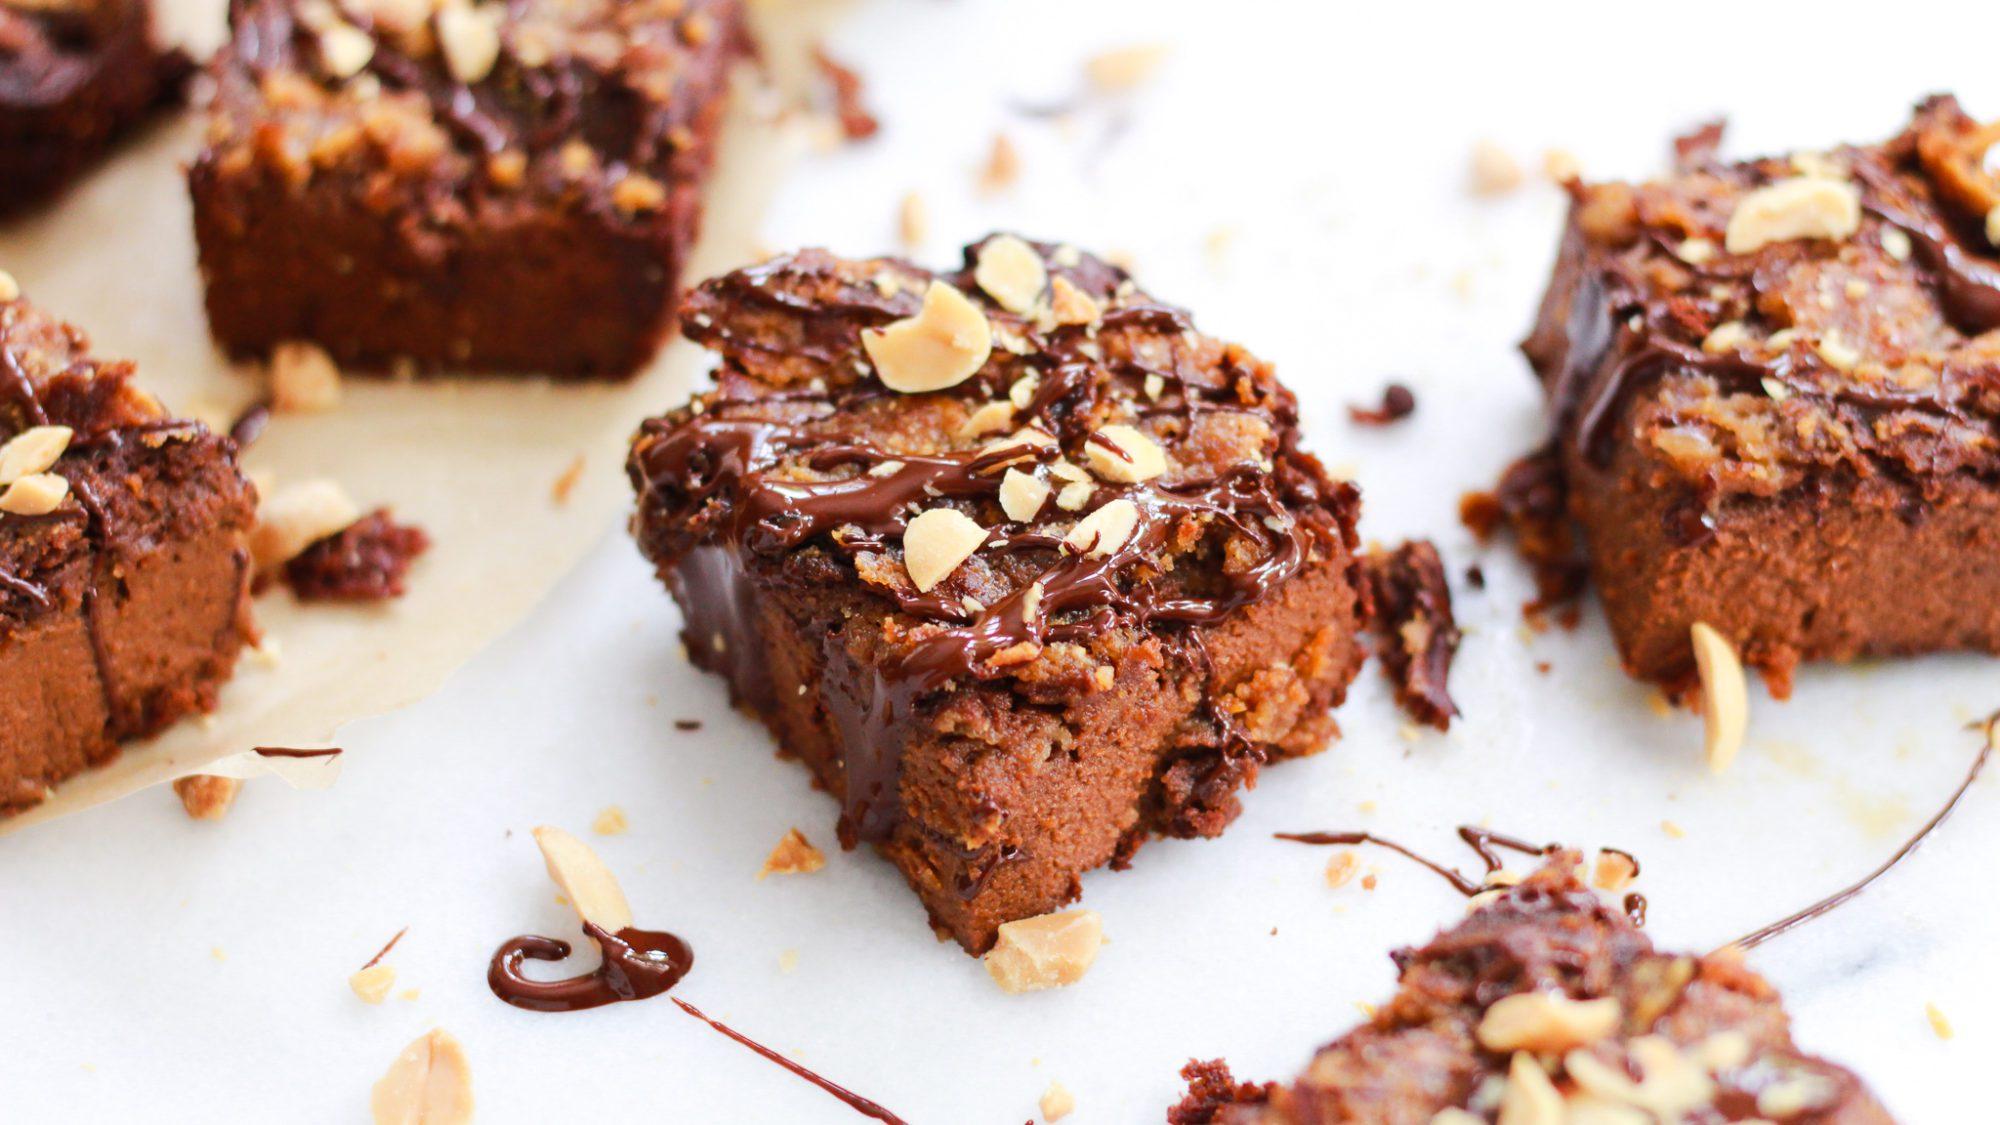 header for peanut butter swirl brownies